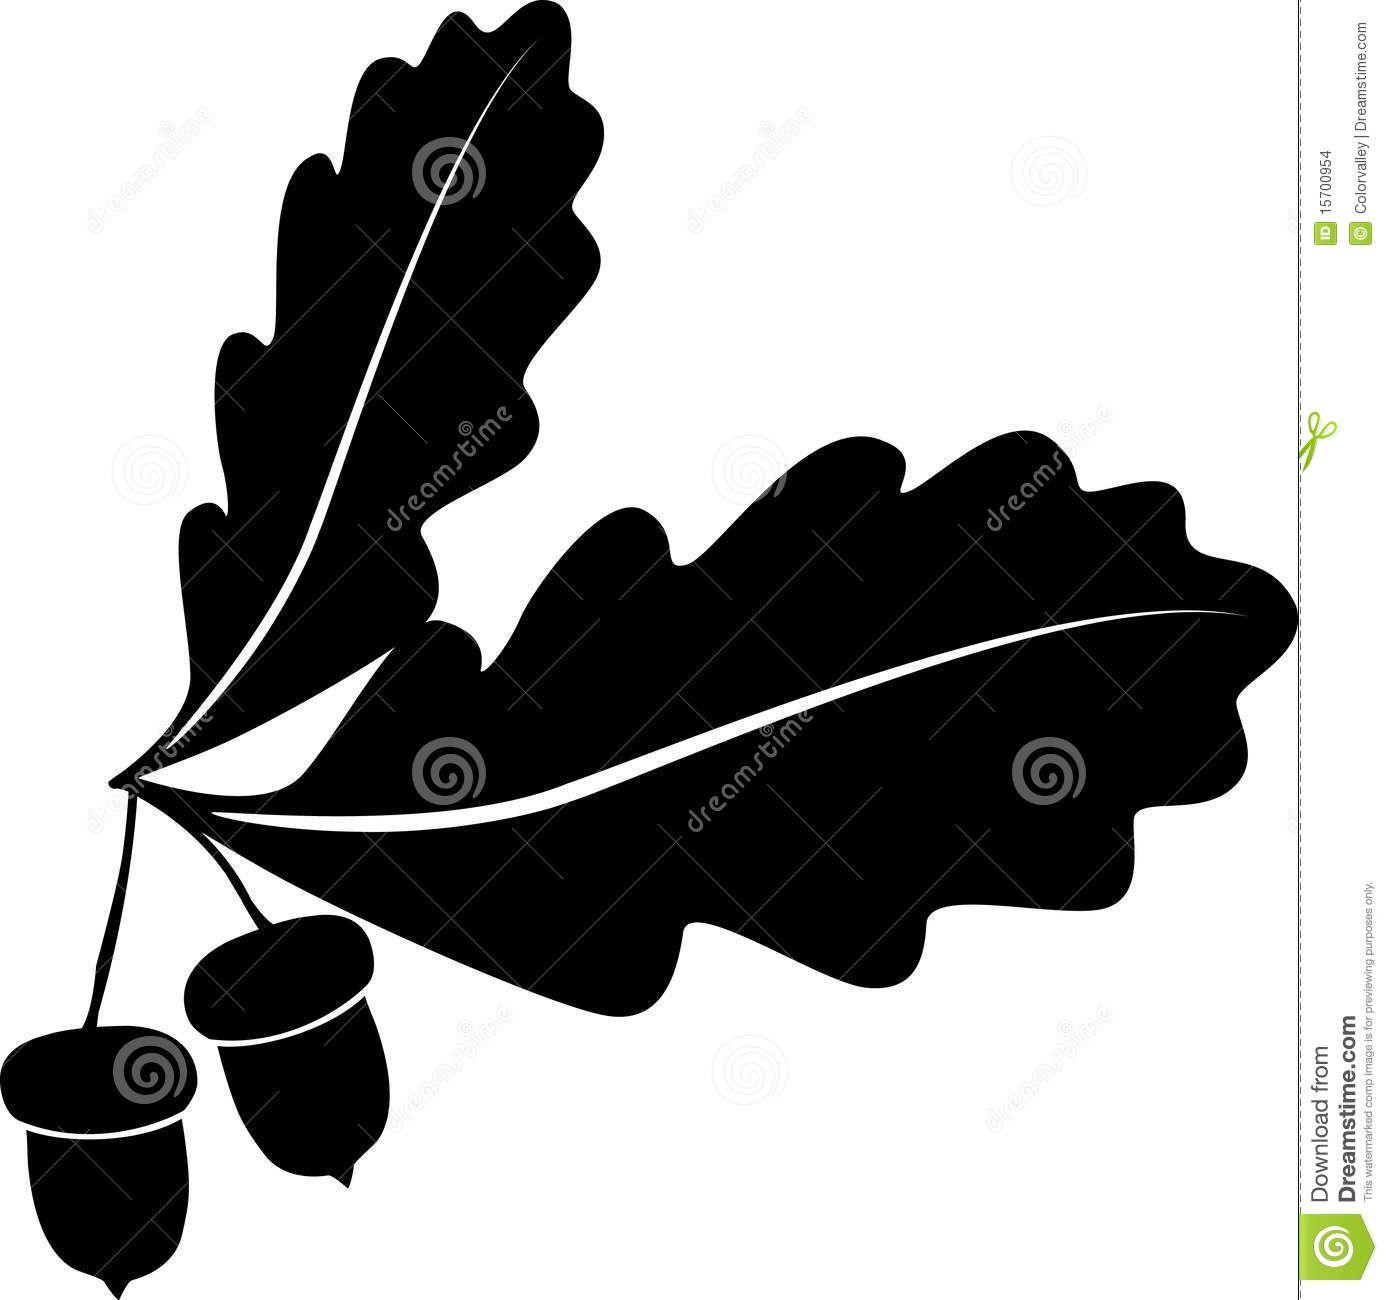 Major oak leaf clipart black and white vector freeuse Oak Tree Tattoo Stock Illustrations, Vectors, & Clipart ... vector freeuse